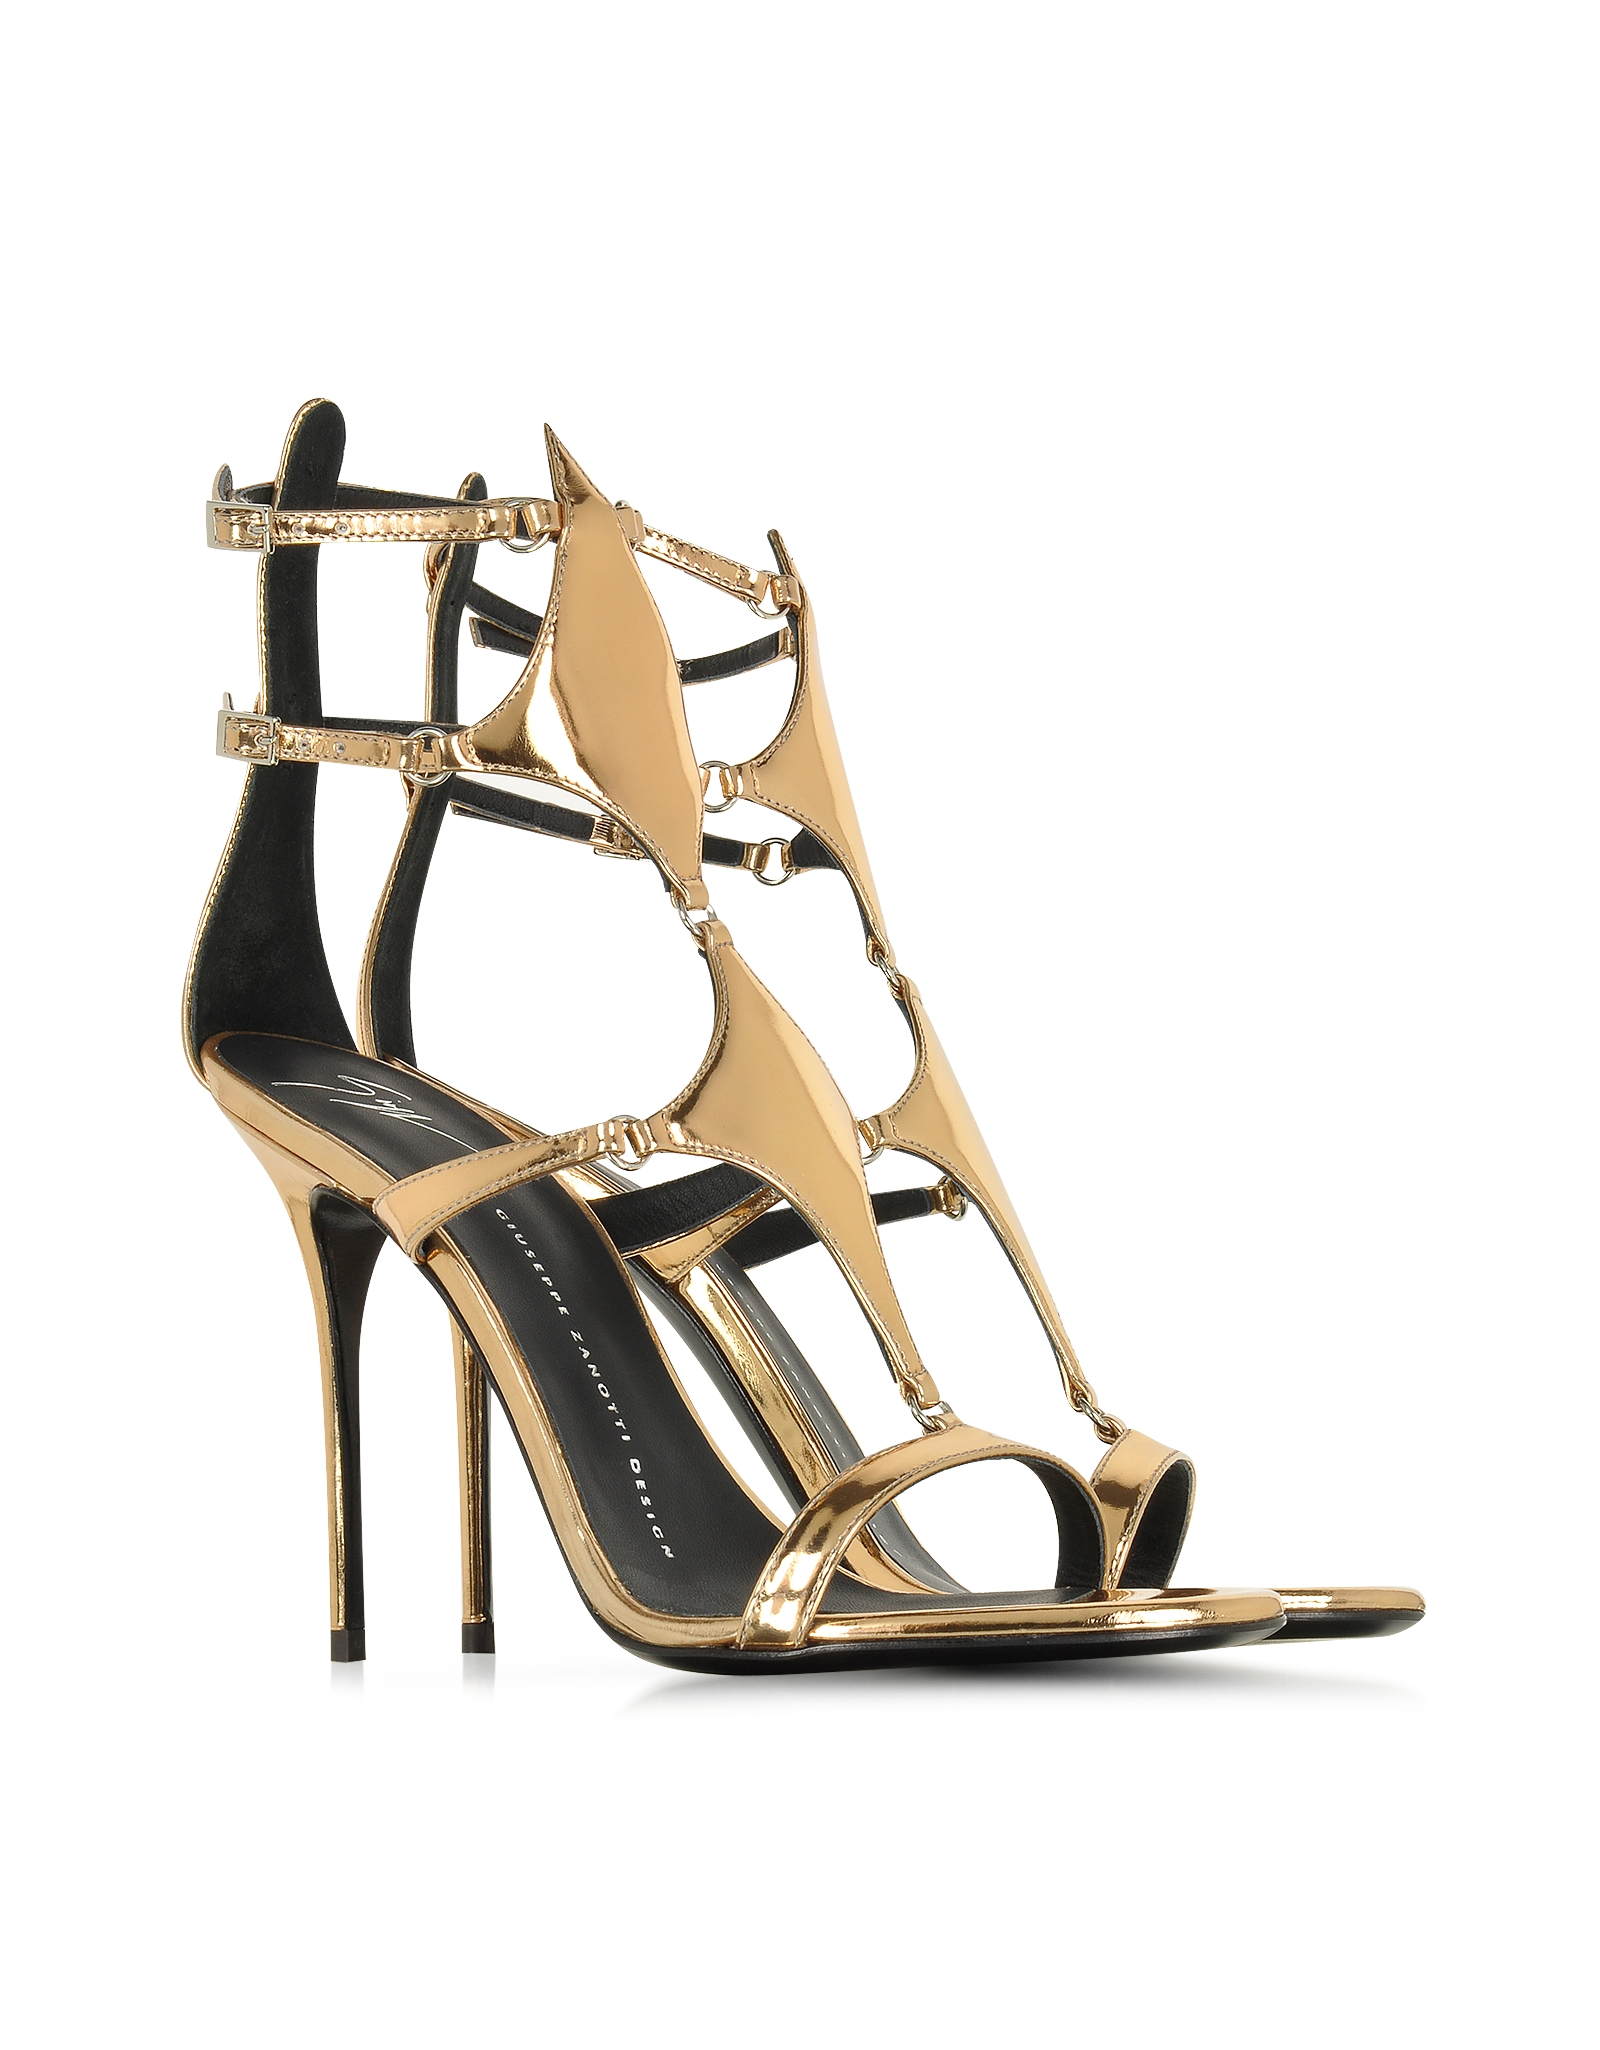 17e7bc866 Giuseppe Zanotti Darlene Bronze Metallic Patent Leather Sandal in ...